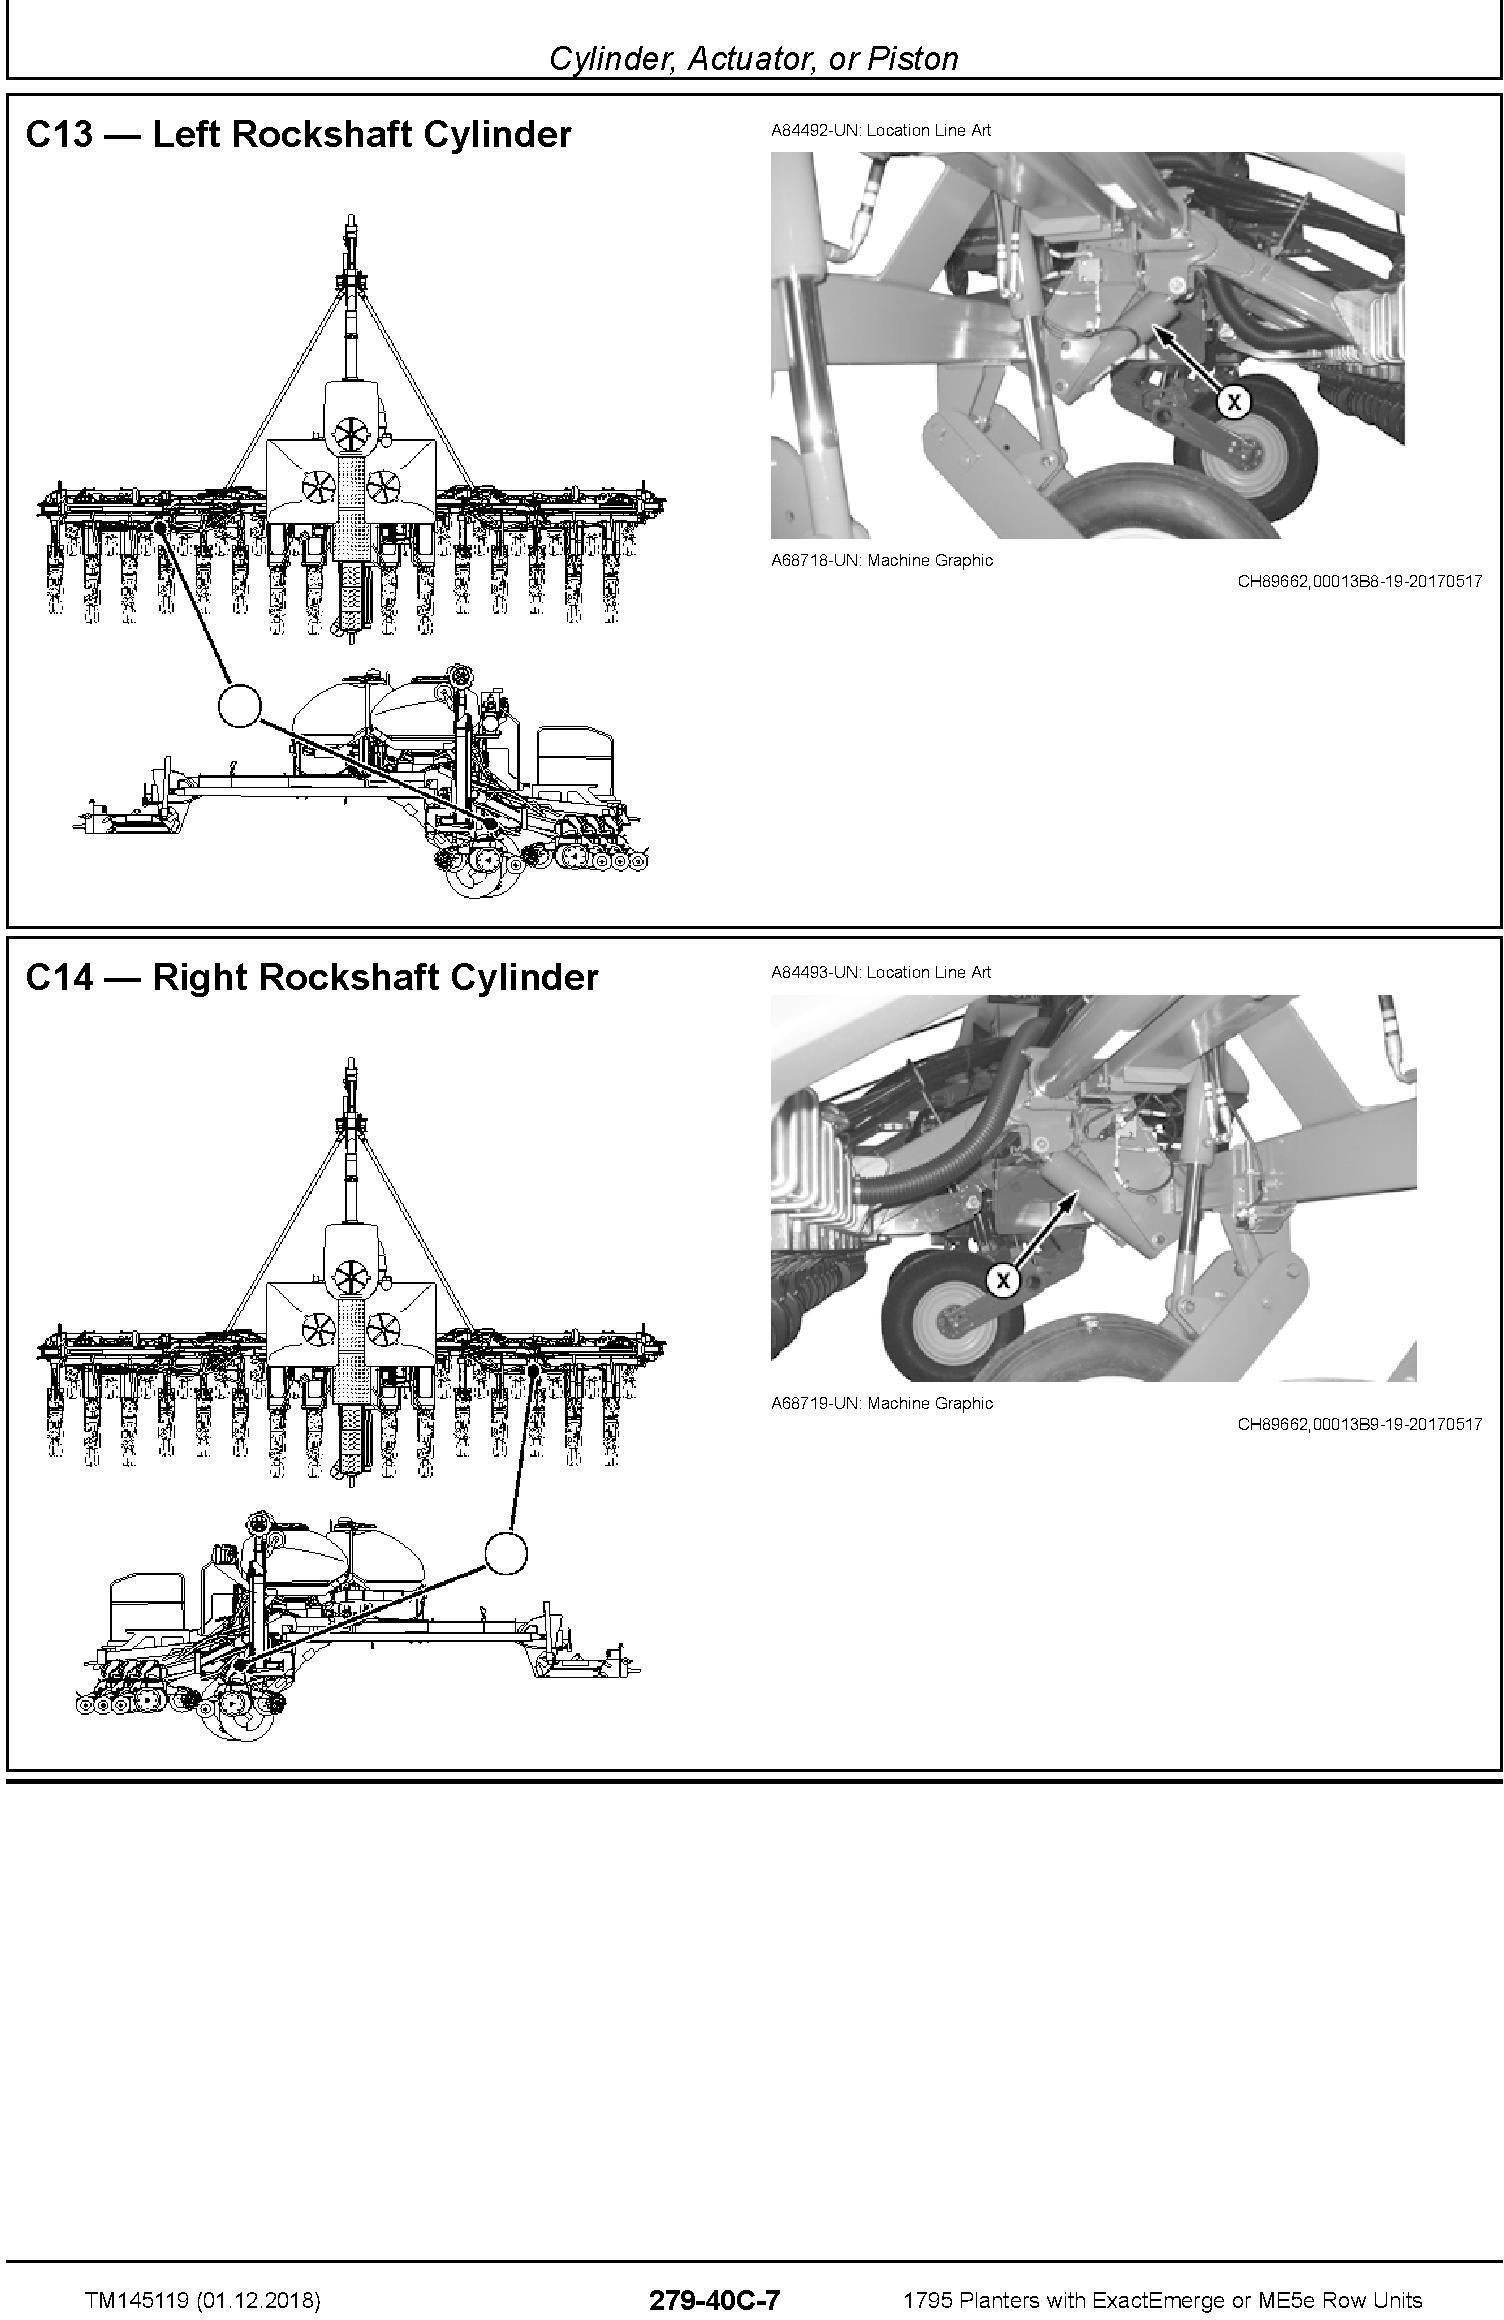 John Deere 1795 Planters with ExactEmerge or ME5e Row Units Diagnostic Technical Manual (TM145119) - 3